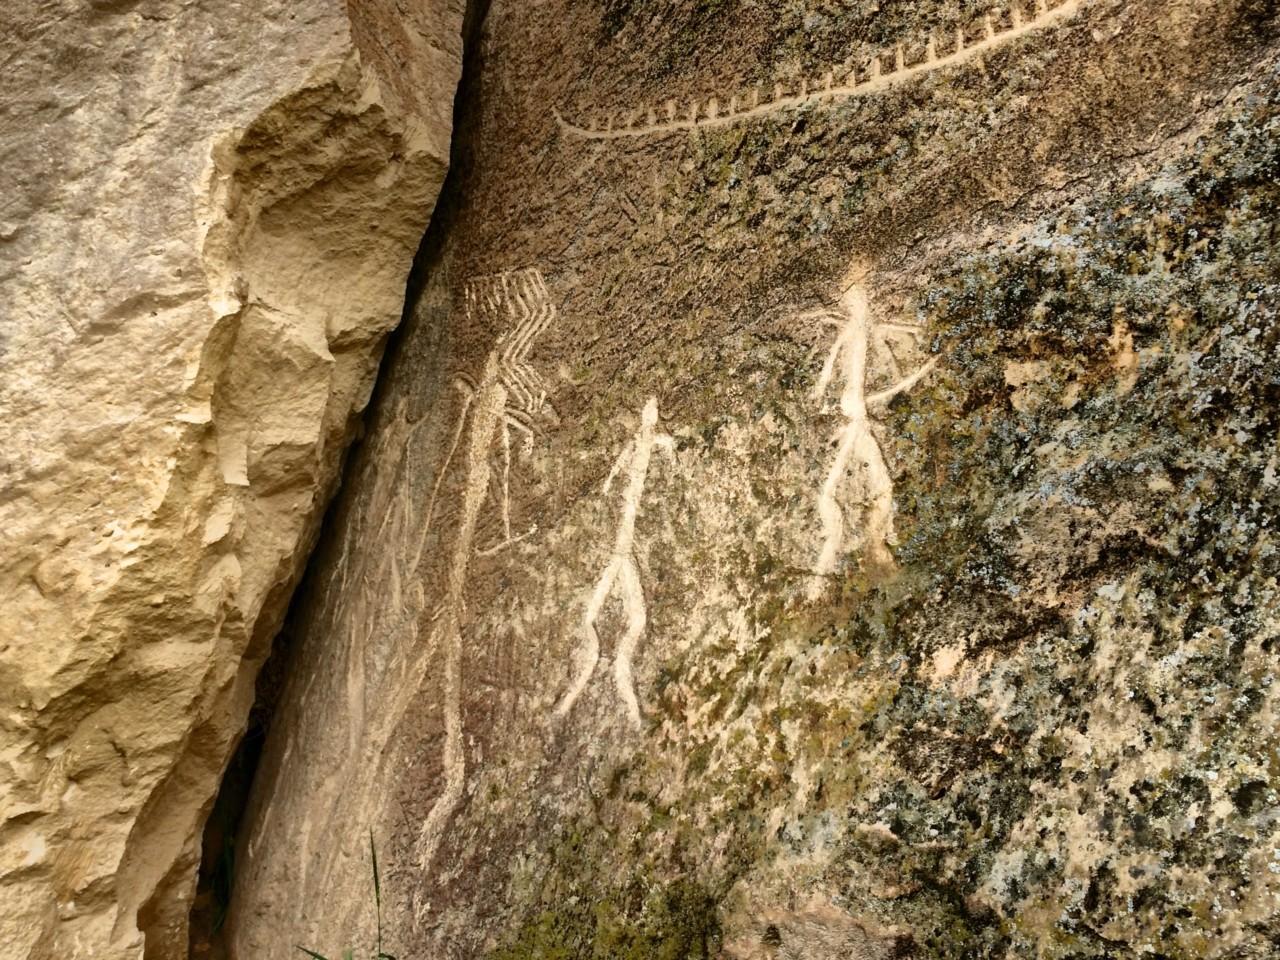 Gobustan petroglyph carving